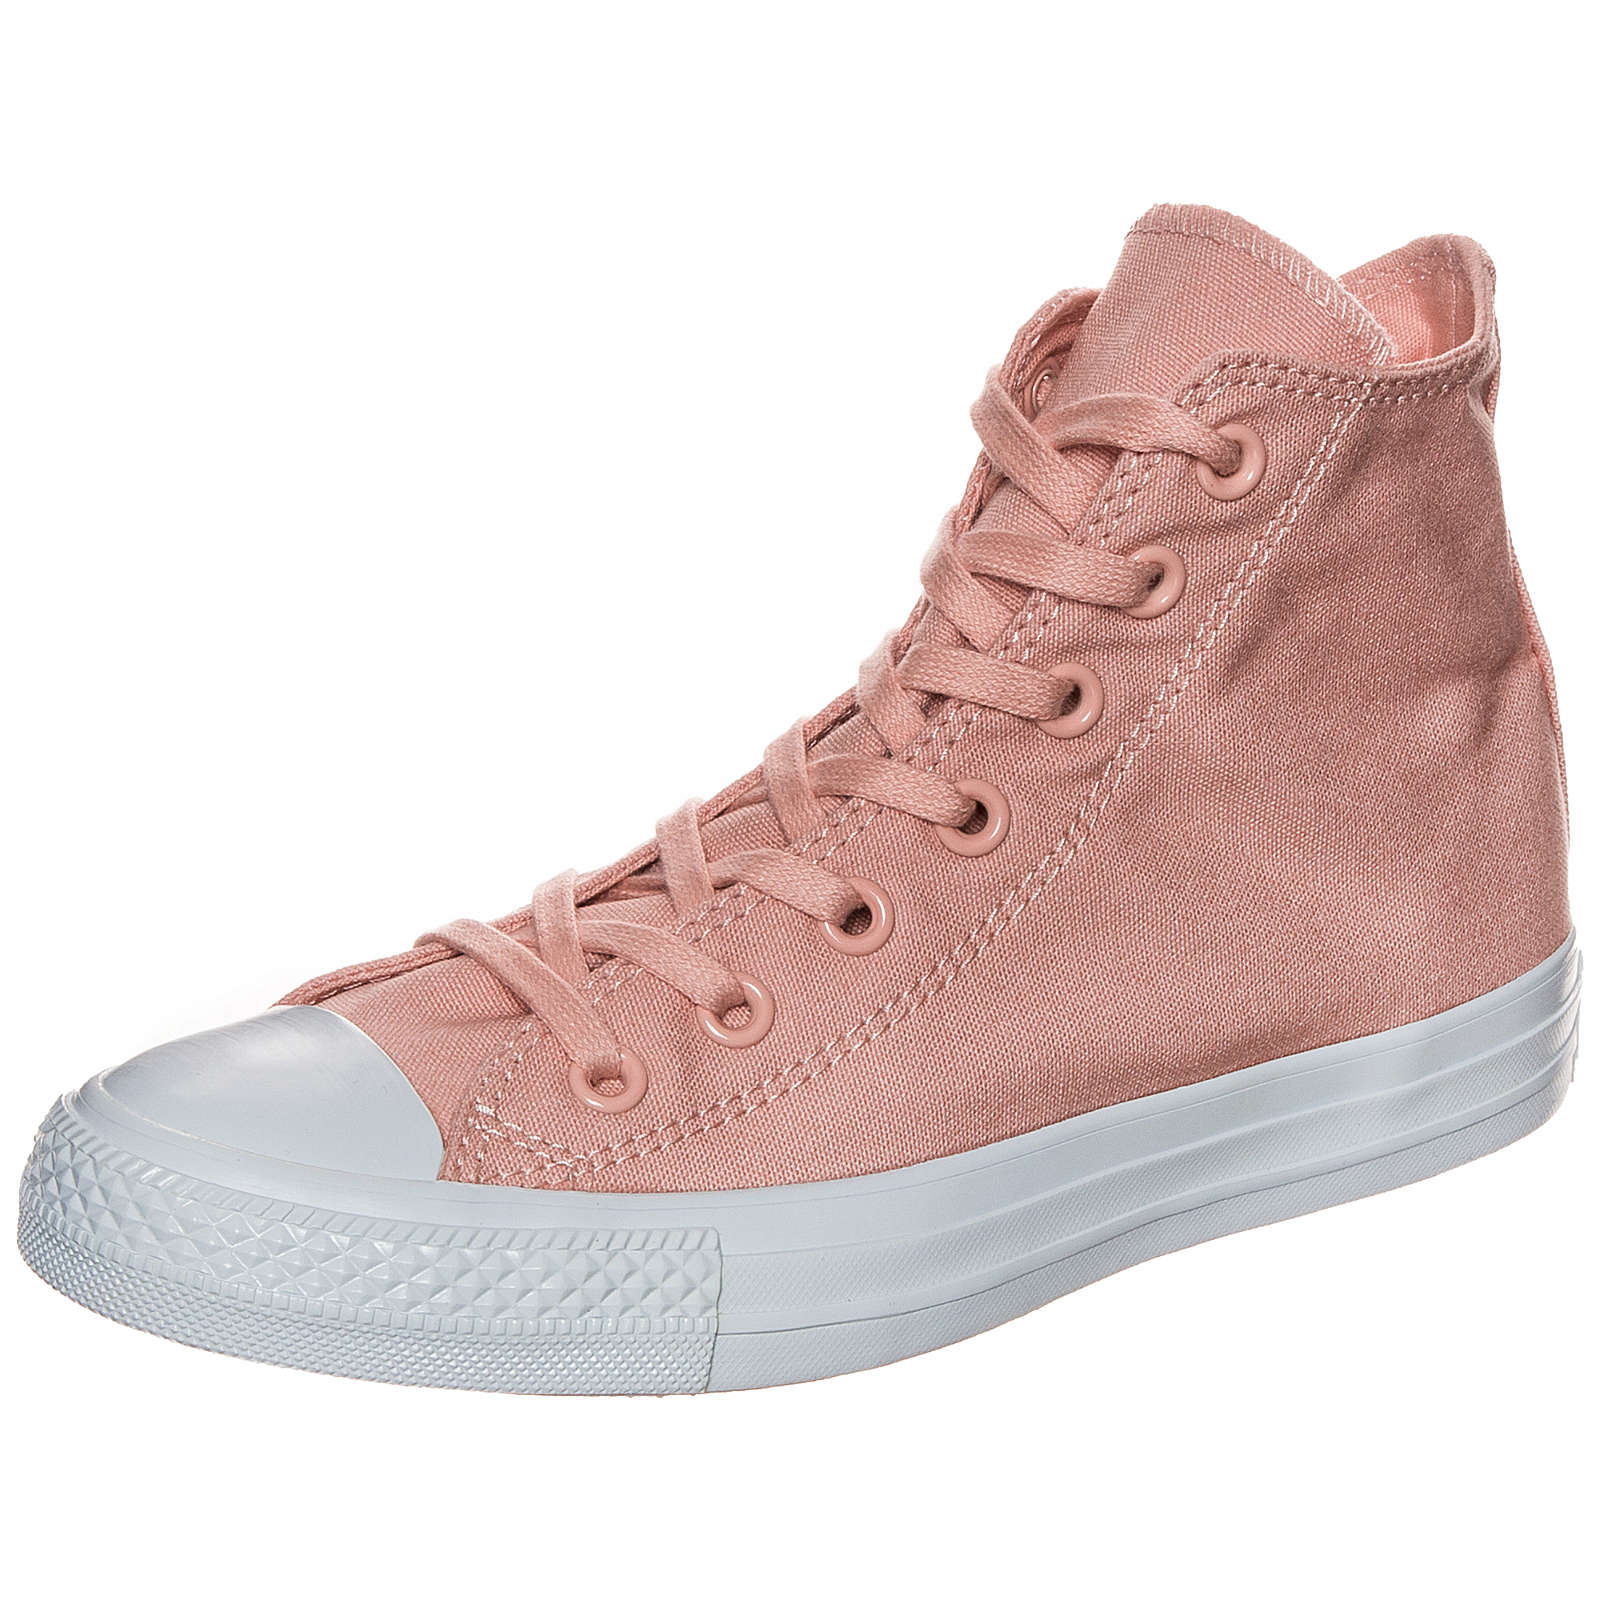 CONVERSE Sneakers rosa Damen Gr. 41,5